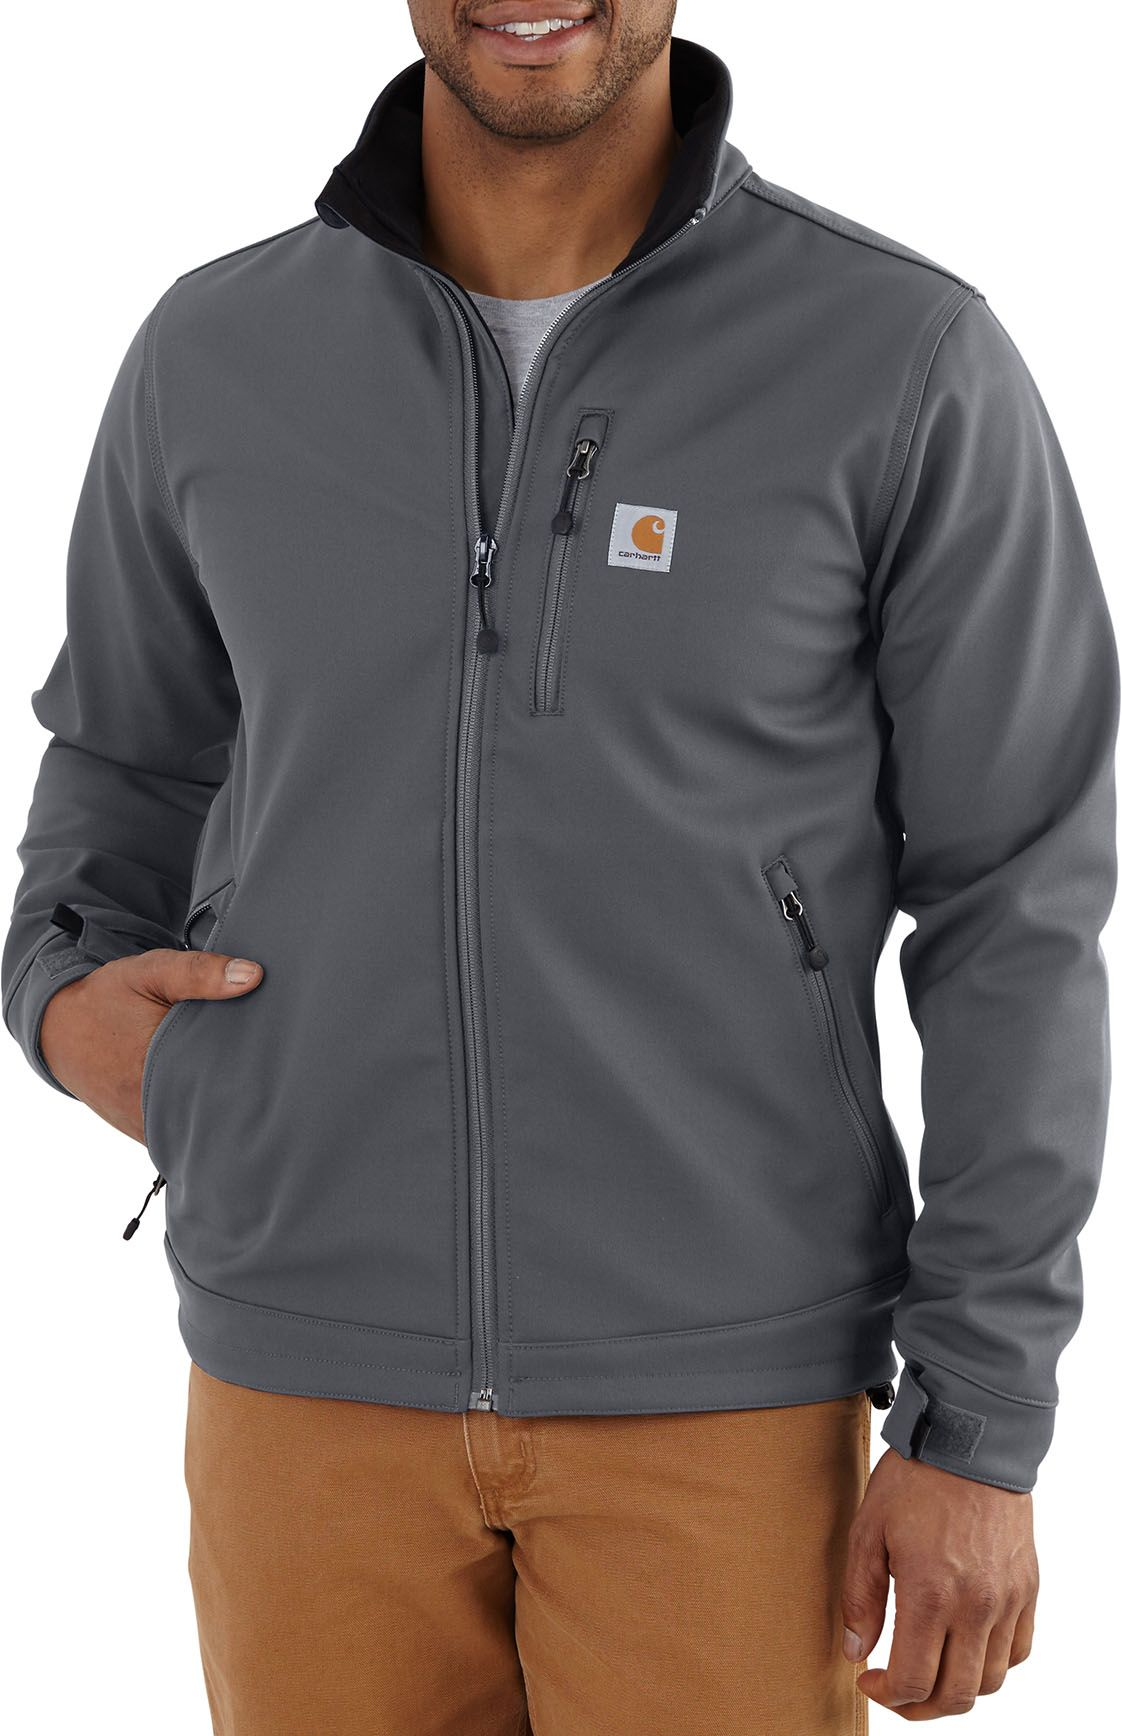 Carhartt Light Work Jacket: Carhartt Men's Crowley Soft Shell Jacket